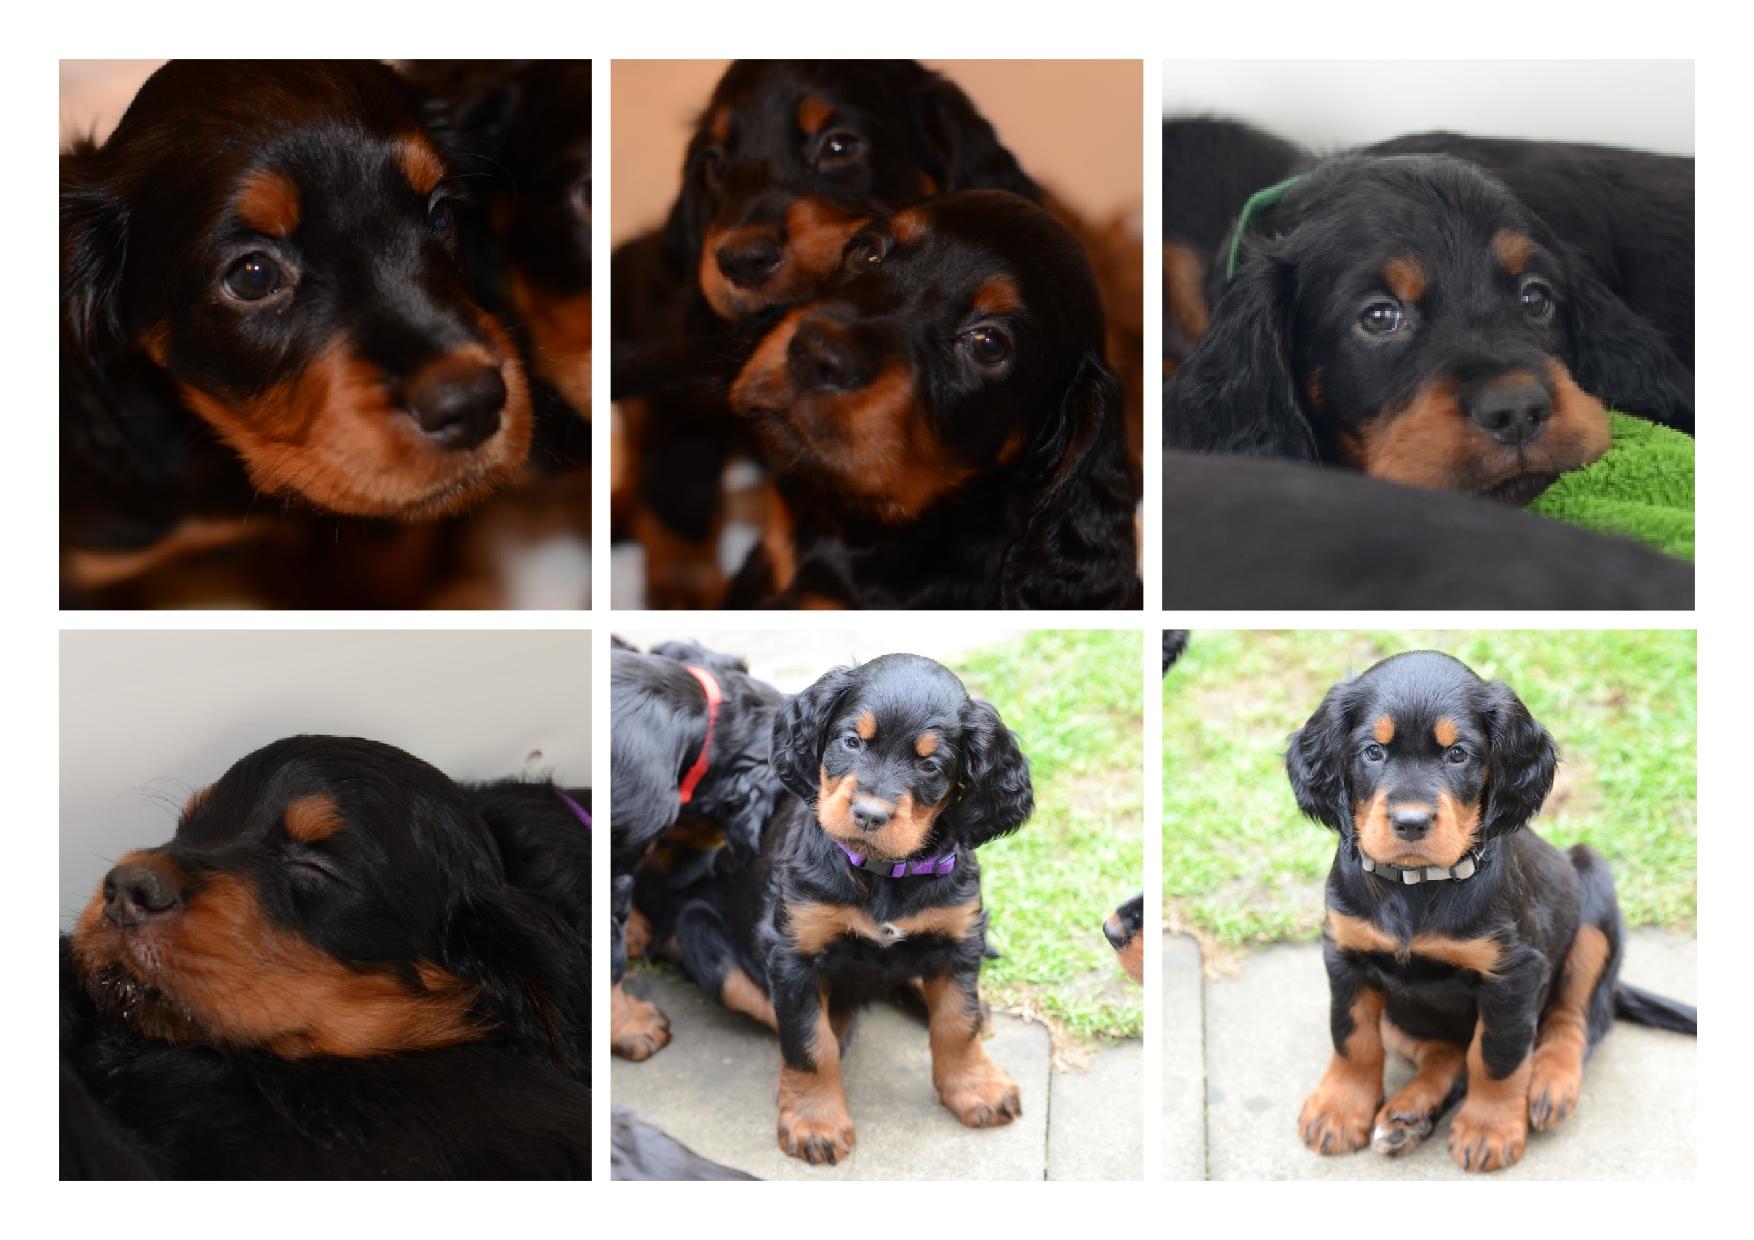 09e6c4ac4 Puppies 4 Oct 2014.4 - Lainnireach Gundogs